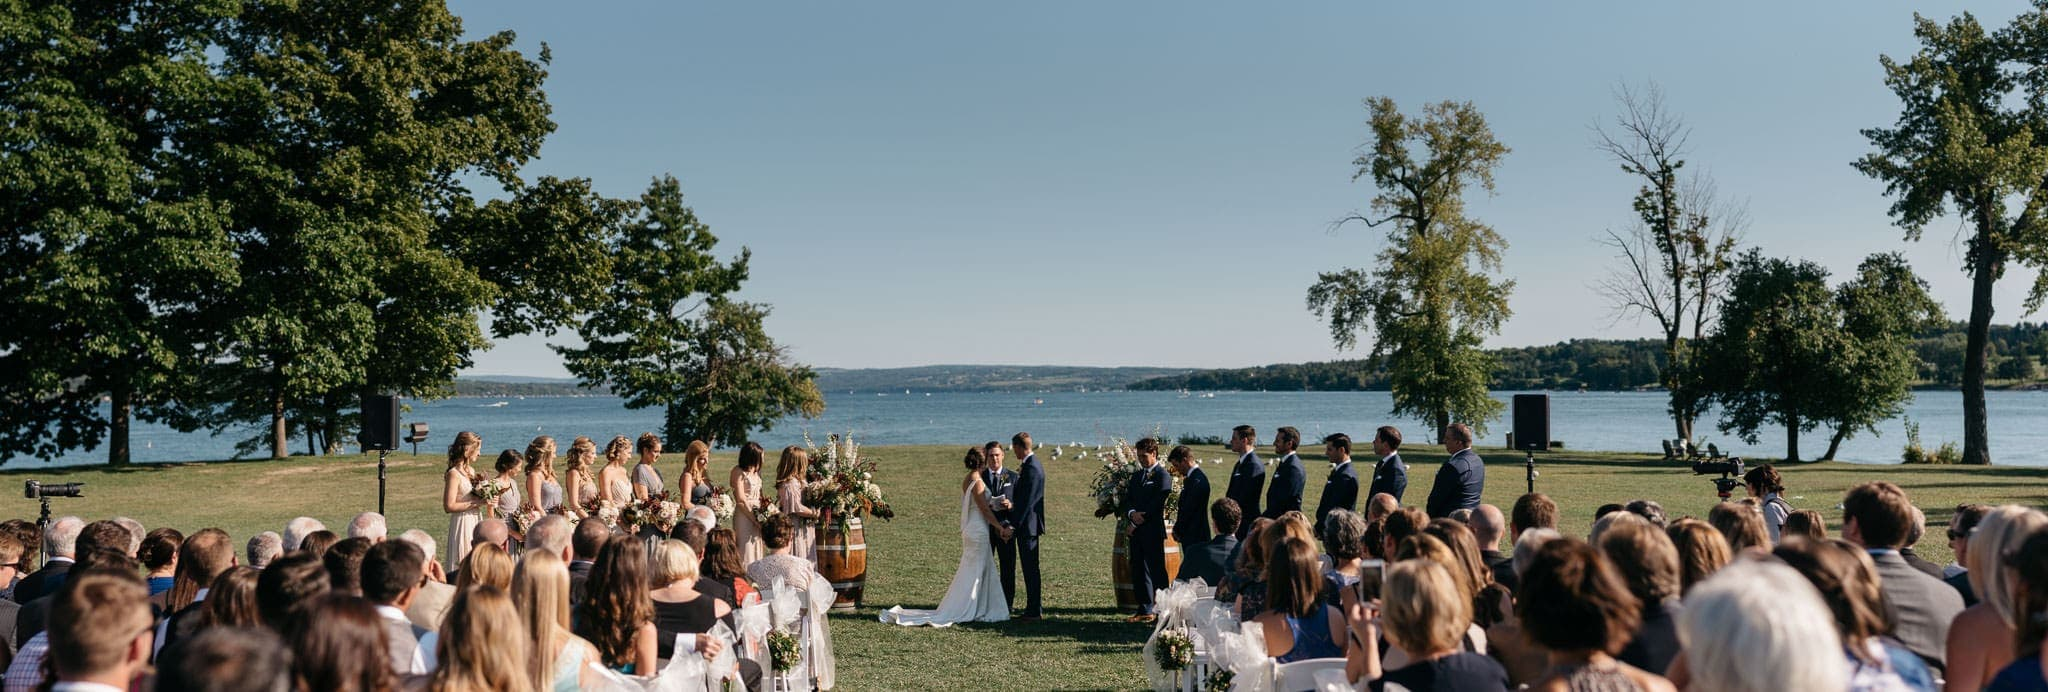 skaneateles-country-club-wedding-23